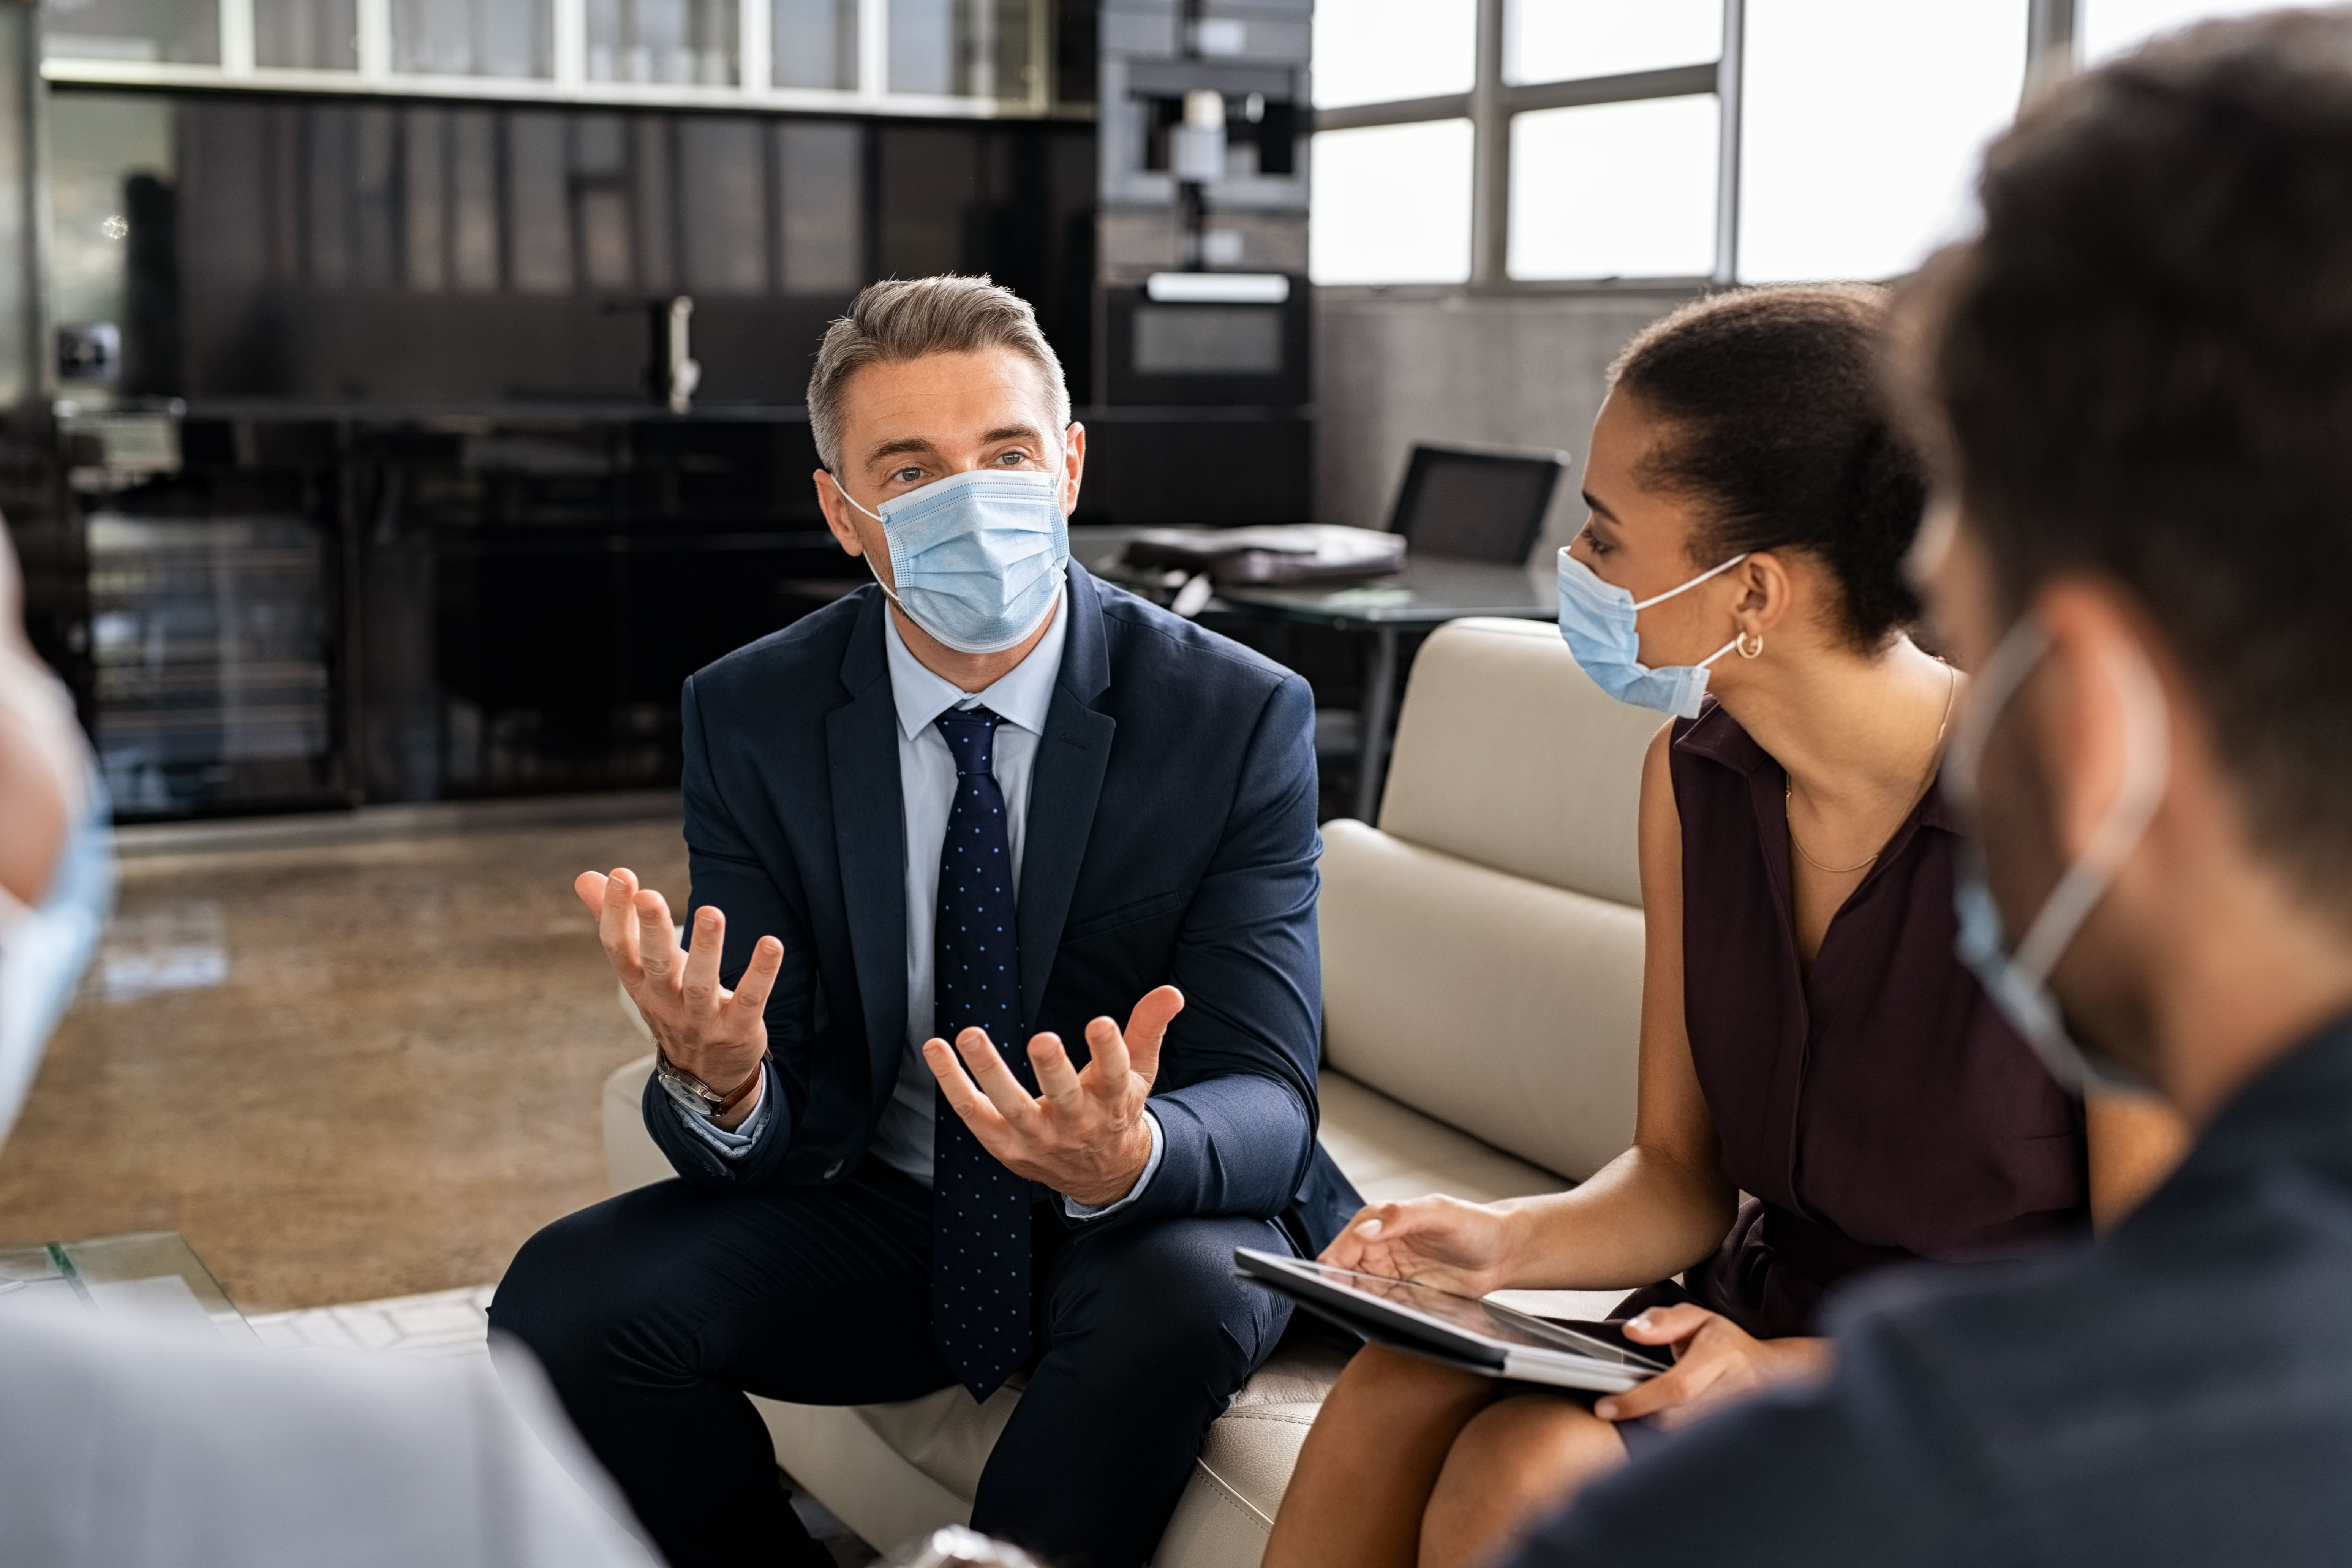 How Daily Self-Screening Can Help Reduce Virus Exposure